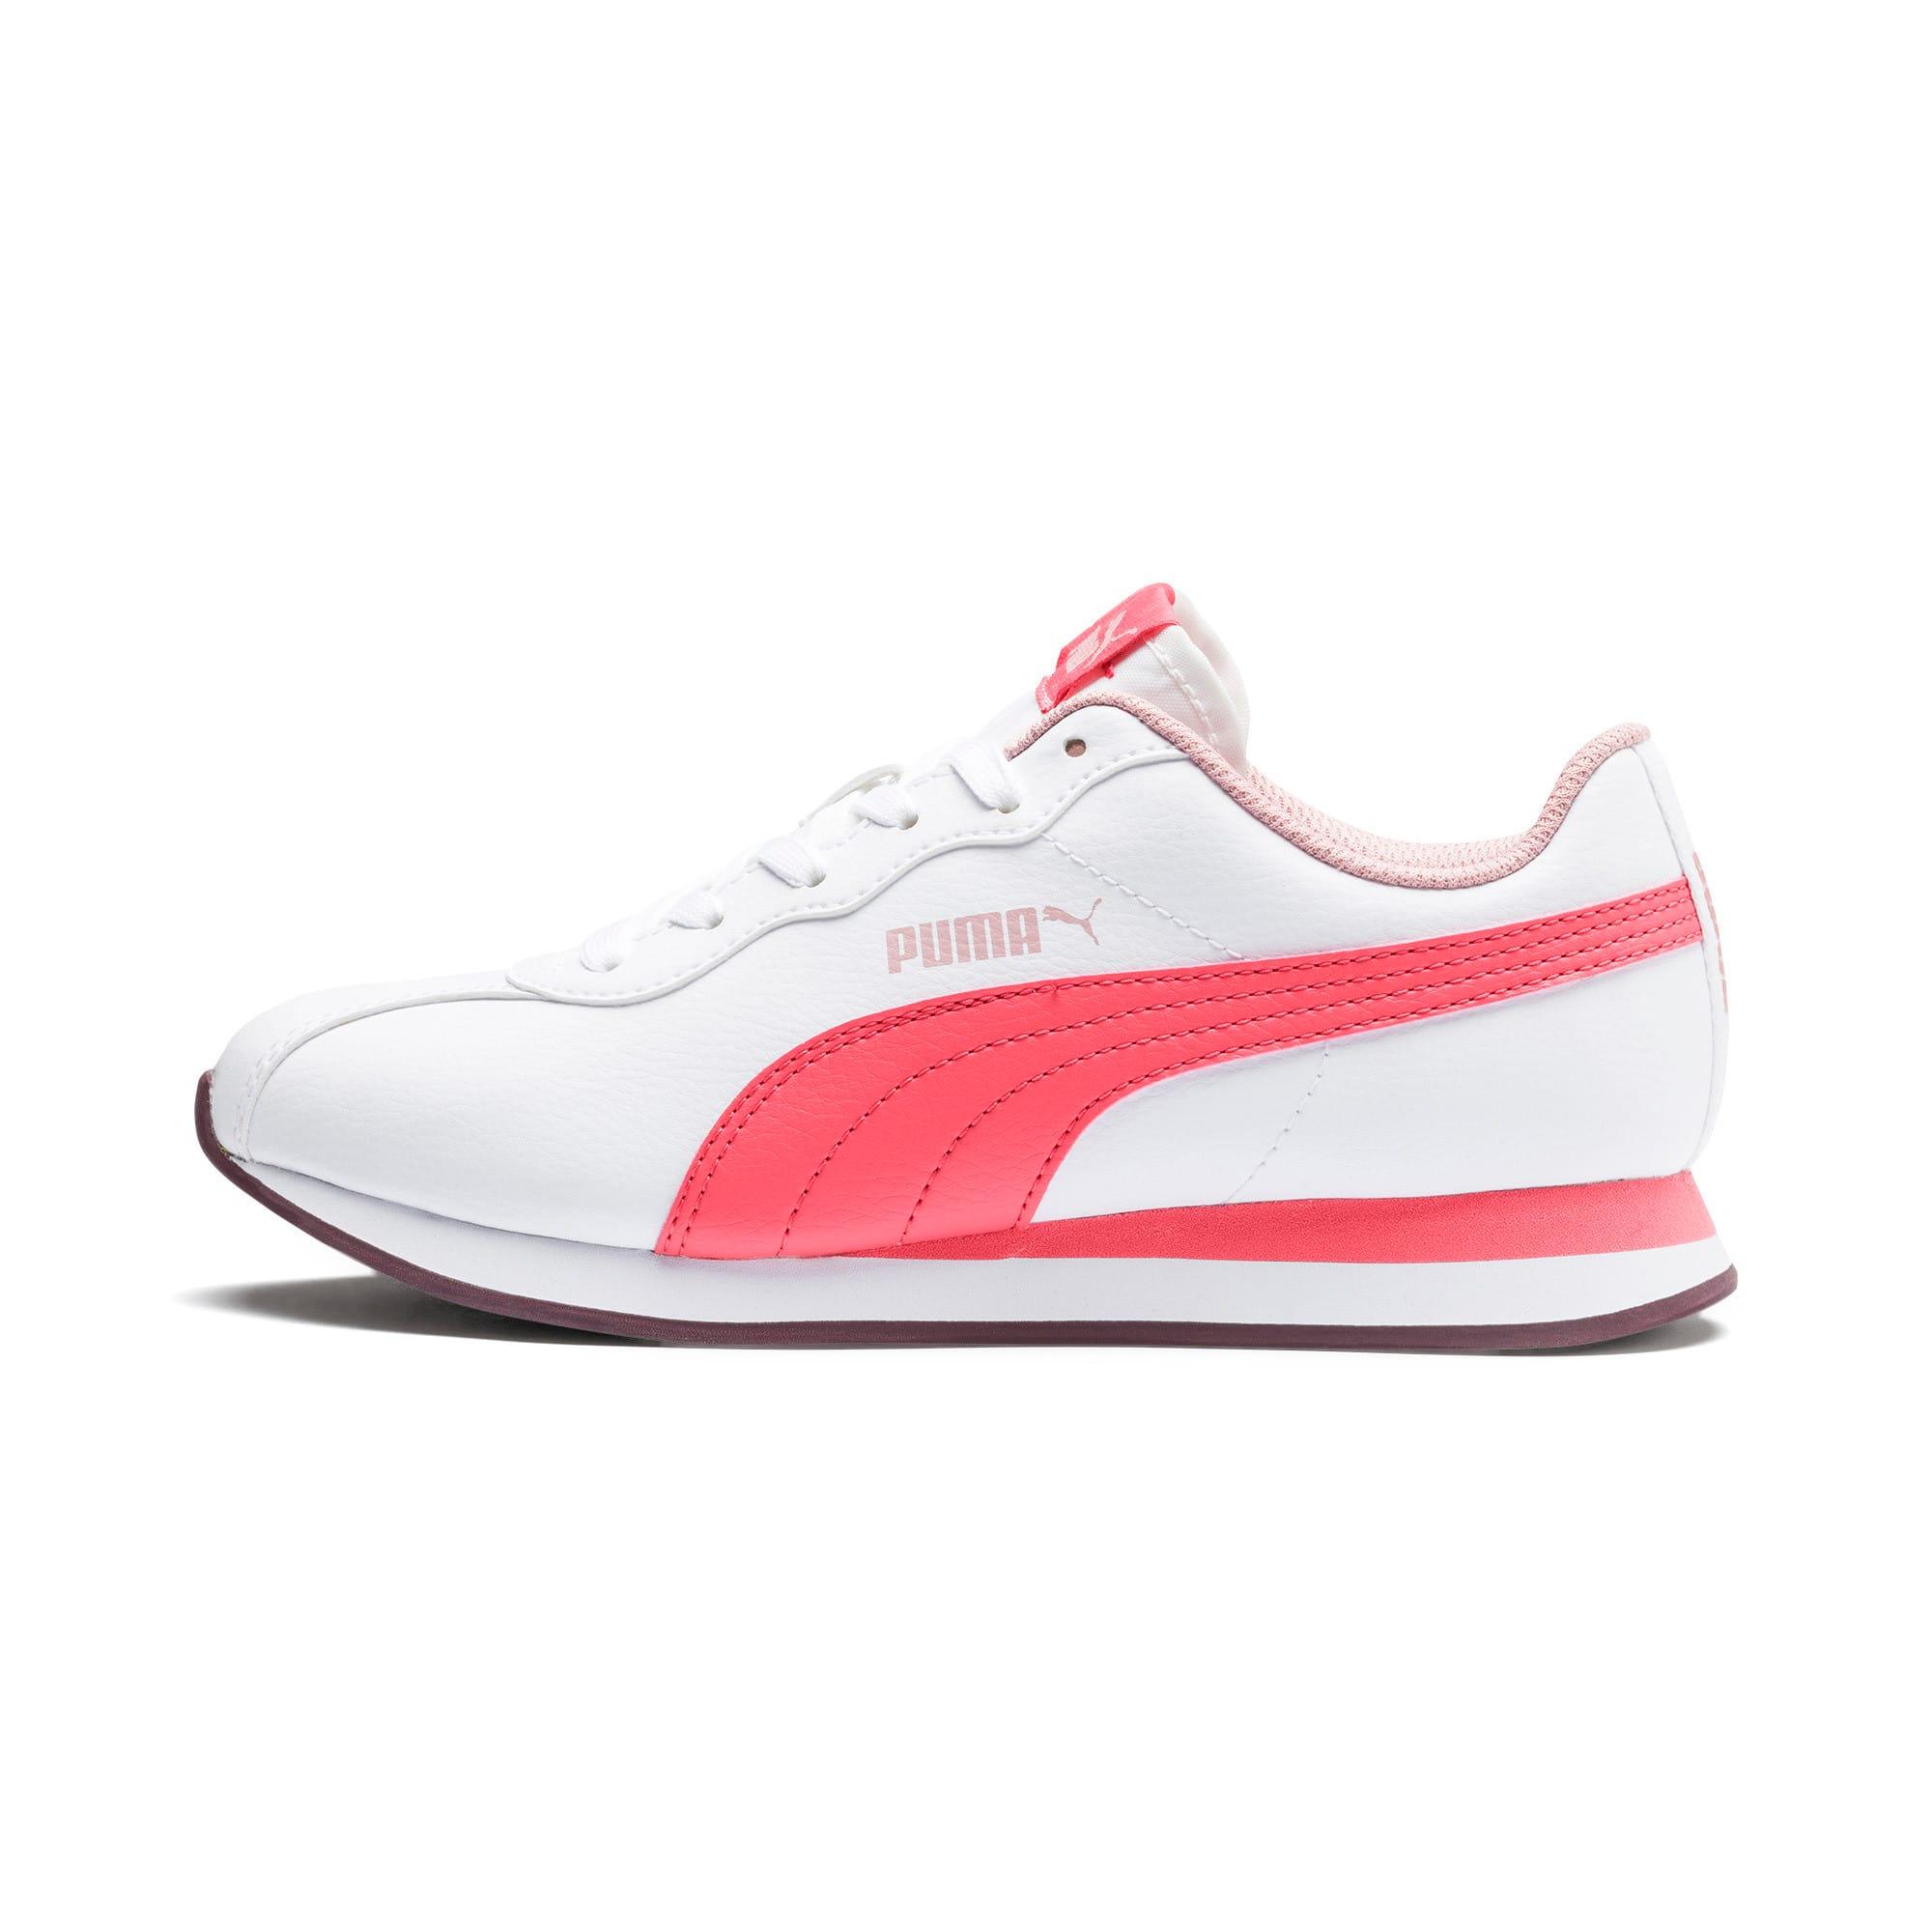 Miniatura 1 de Zapatos deportivos Turin II para JR, Puma White-Calypso Coral, mediano